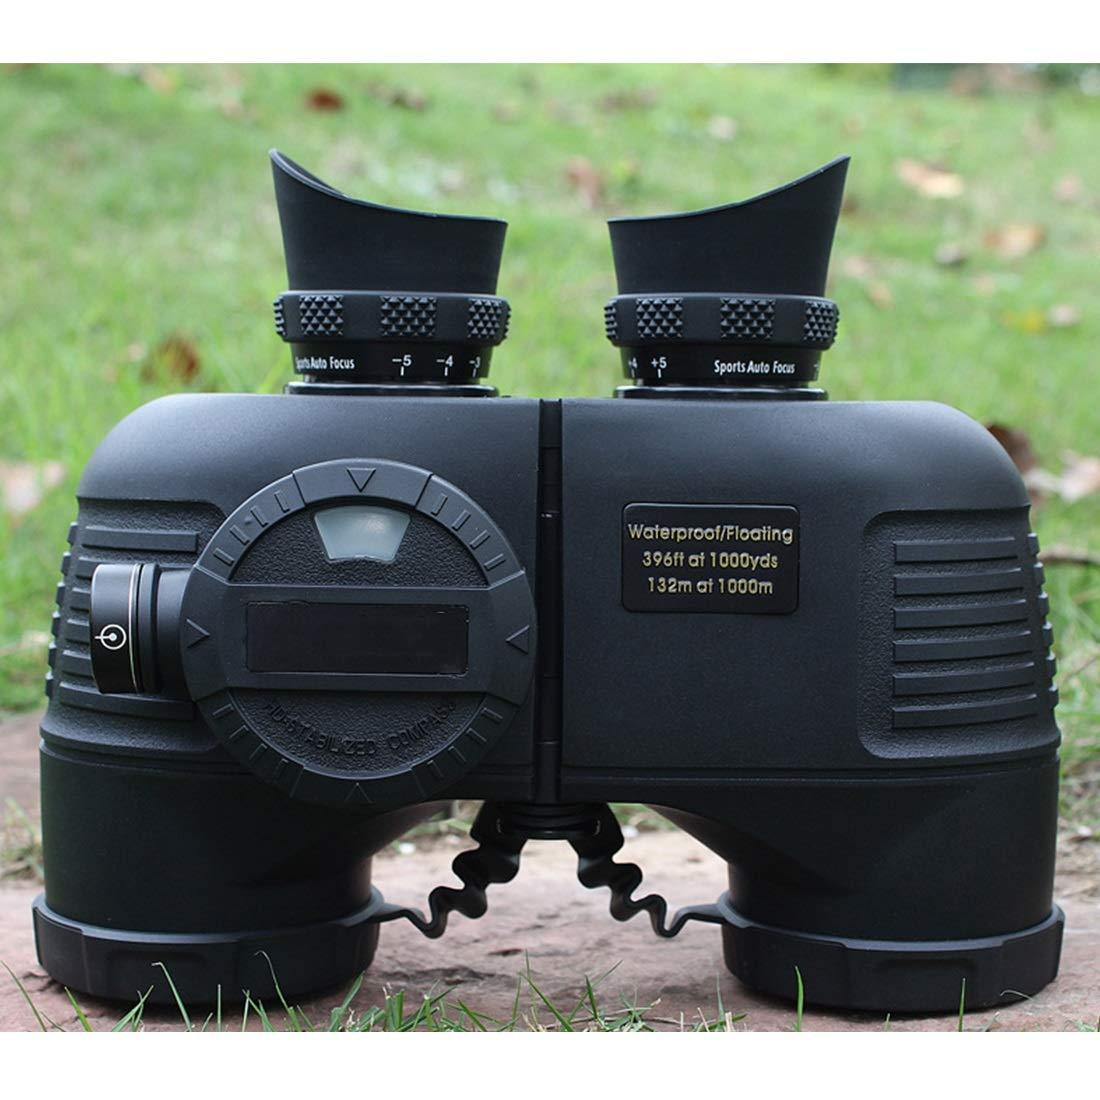 JPAKIOS 望遠鏡 7x50双眼鏡 アウトドア 旅行 コンサート用 相撲観戦 歌舞伎鑑賞 狩猟 収納バッグ付き BAK4プリズムFMCレンズ コンパス 羅針盤 (Color : ブラック) B07PLTYT12 ブラック